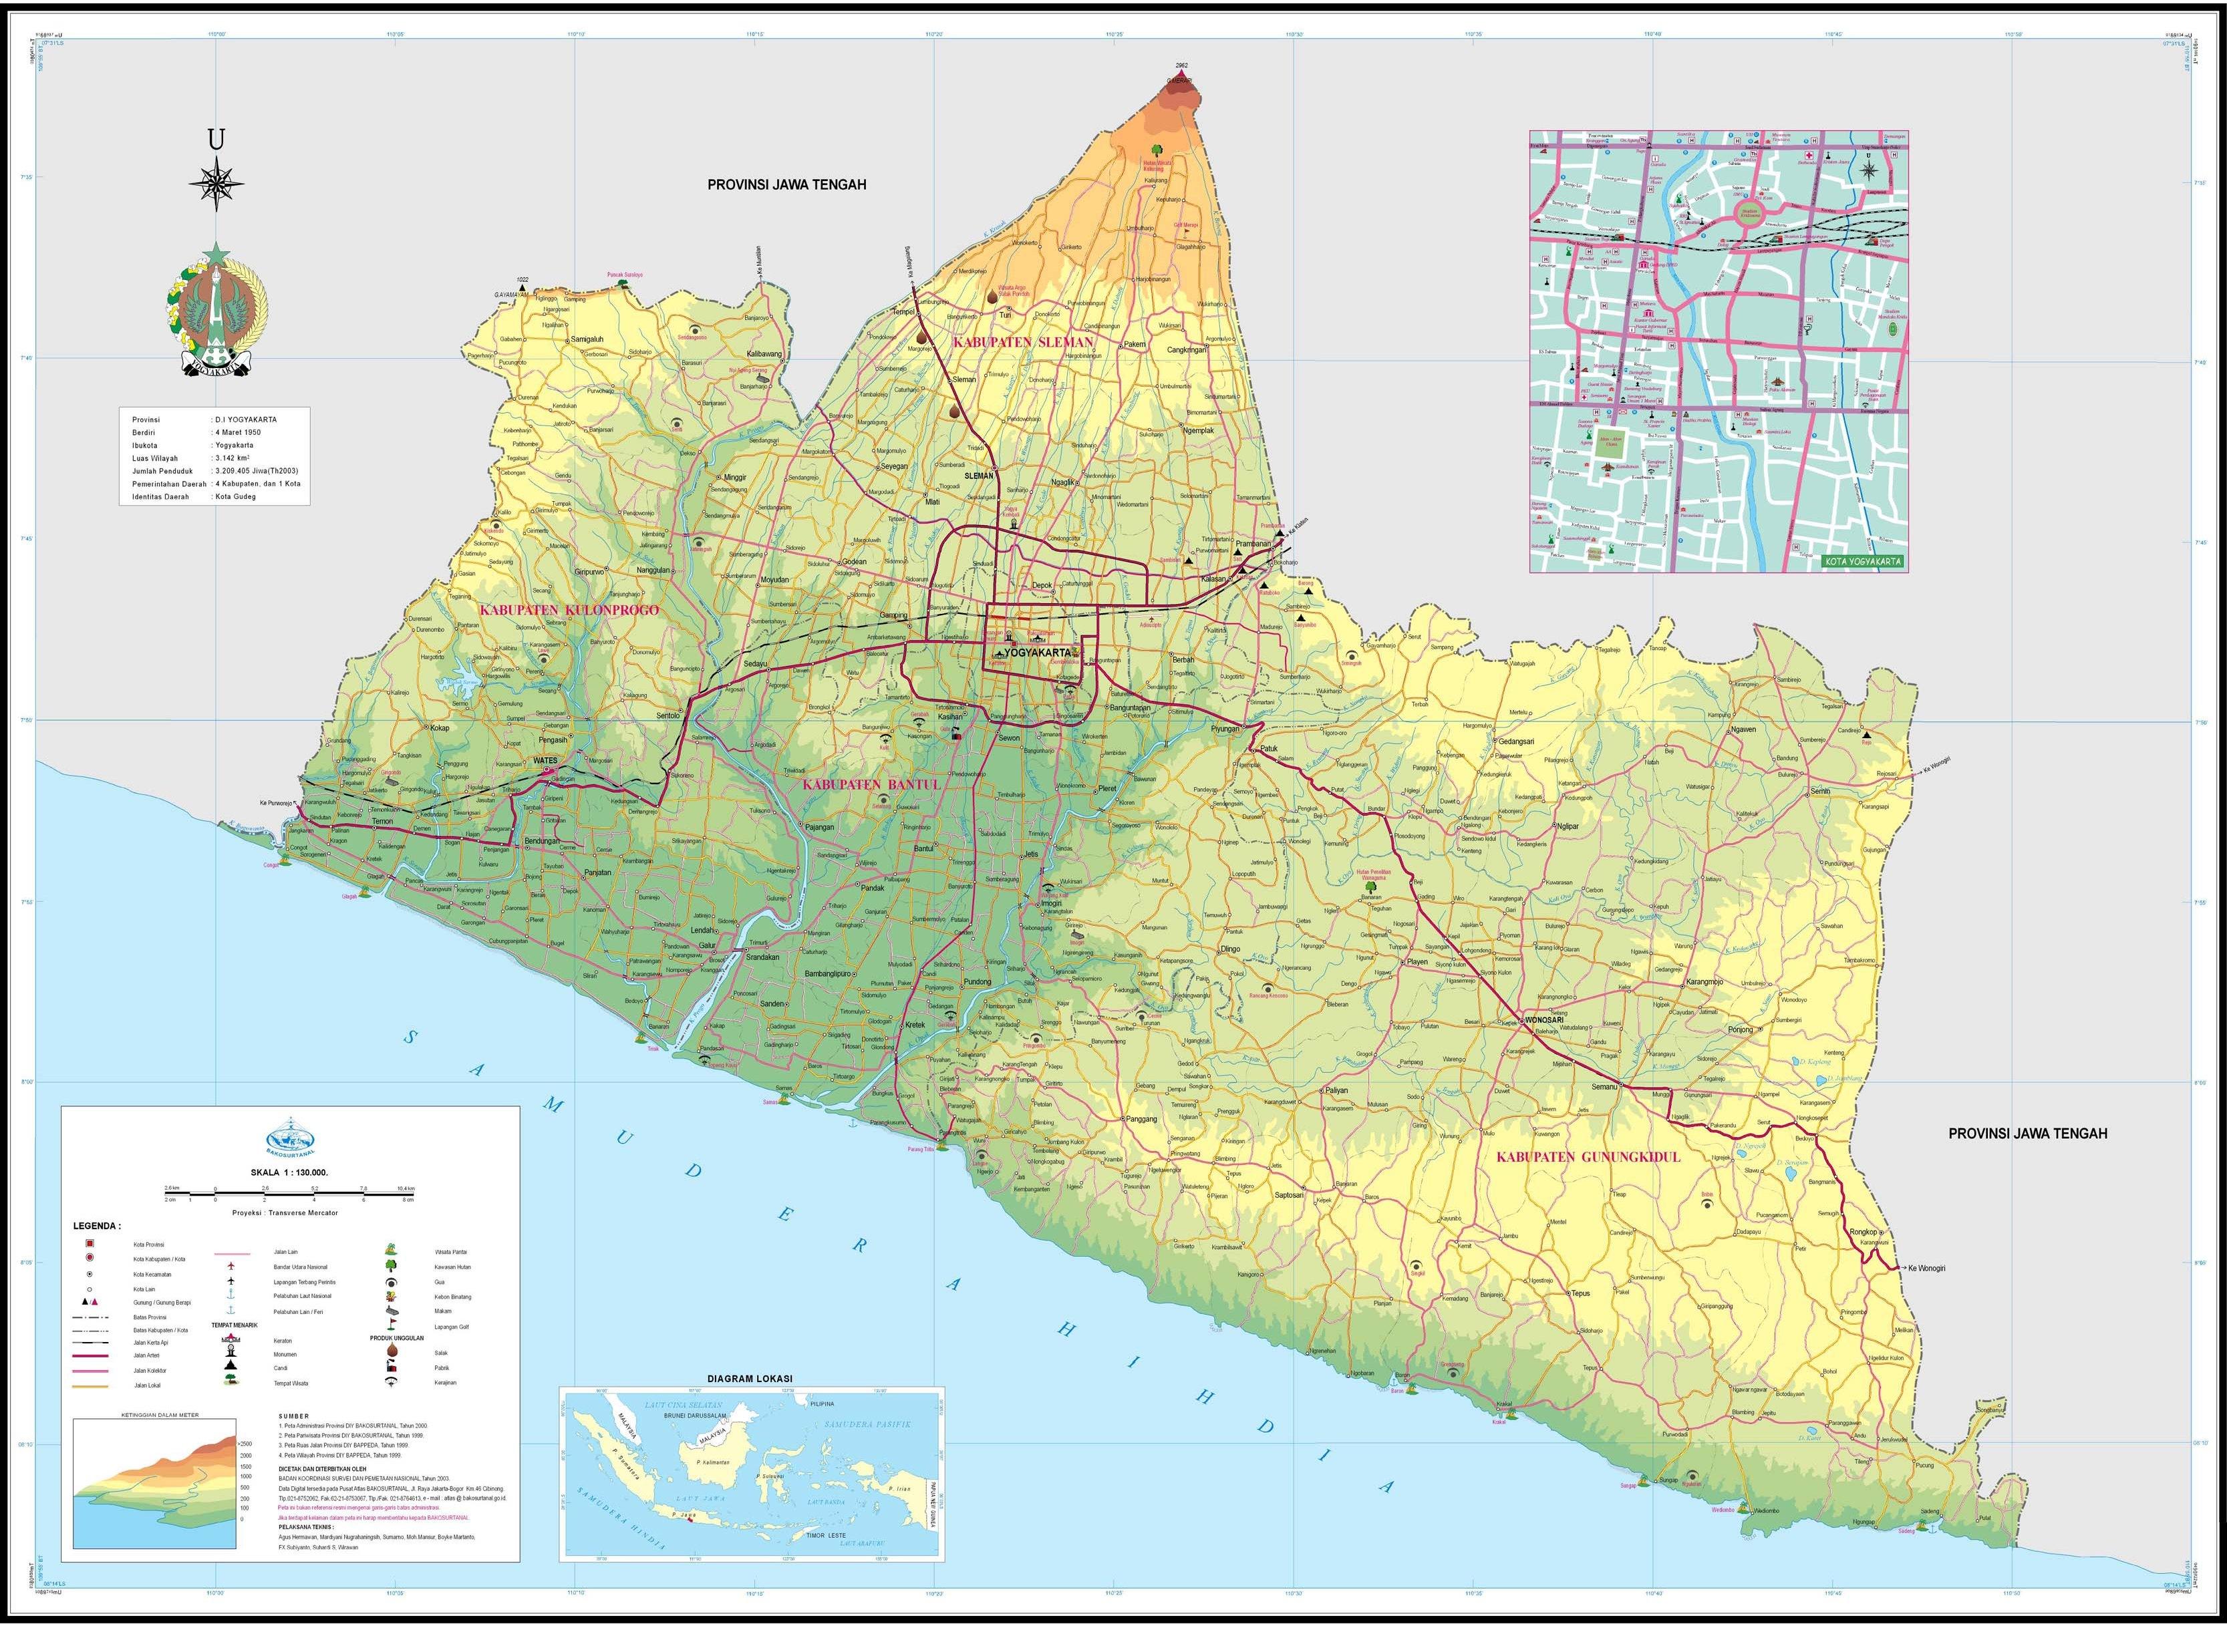 Provinsi DI Yogyakarta